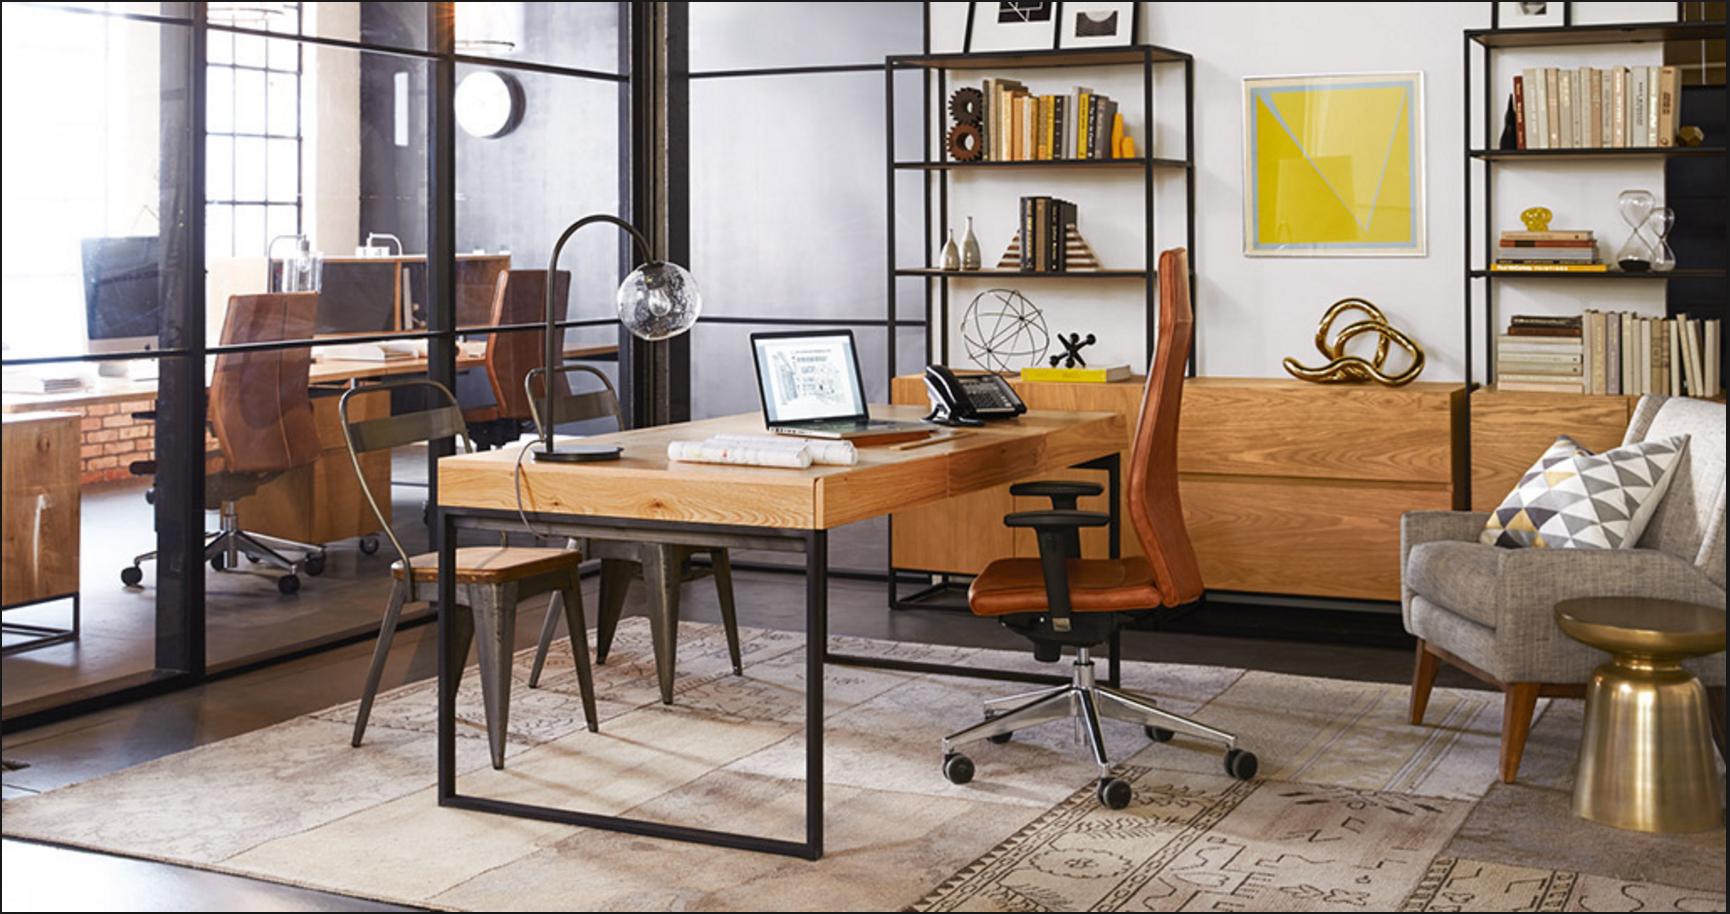 Marvelous West Elm Workspace With Inscape | Inscape Corporation